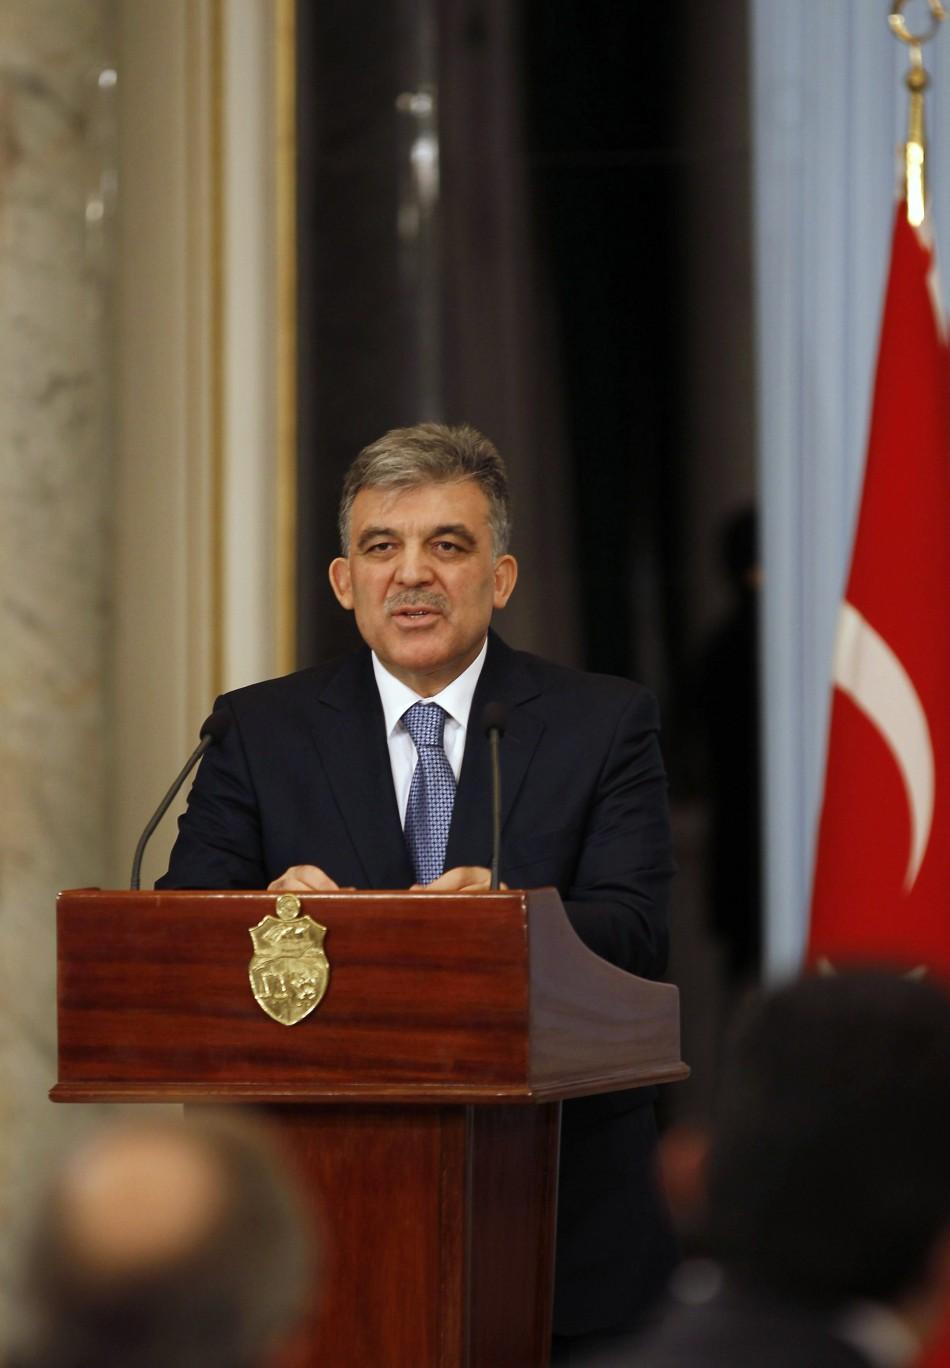 Turkish President Abdullah Gül